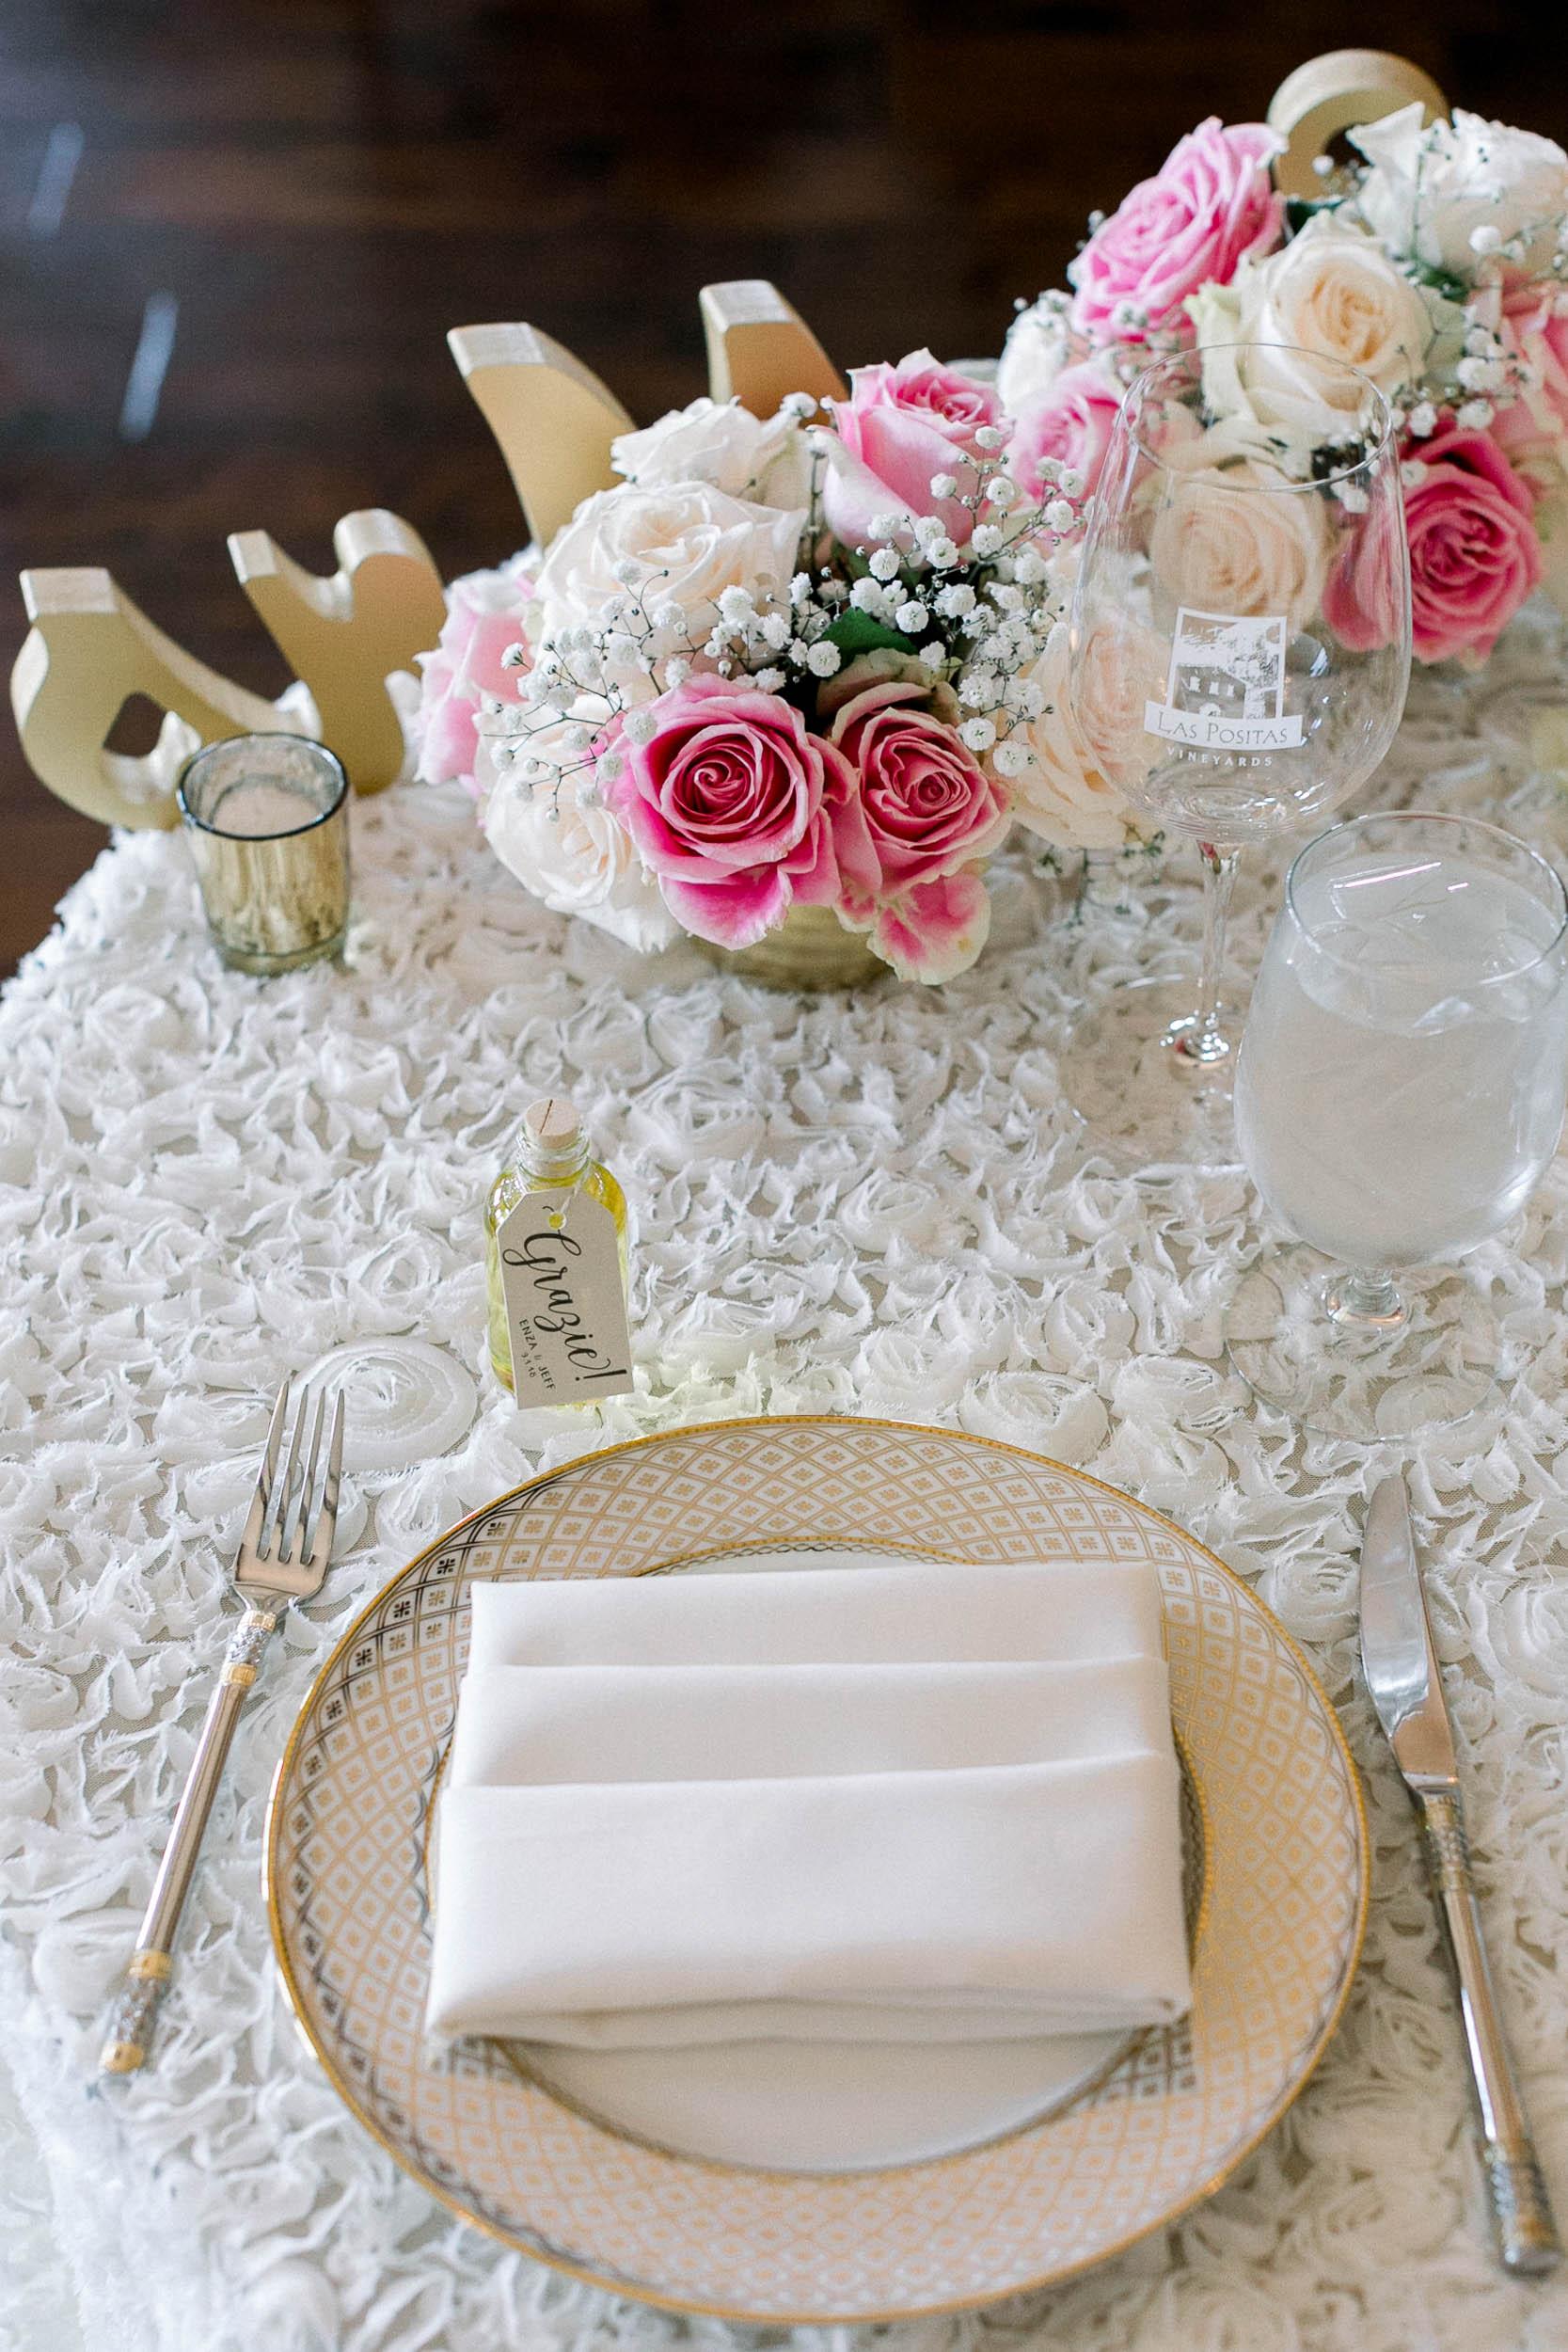 Las Positas Wedding_Buena Lane Photography_090118ER348.jpg